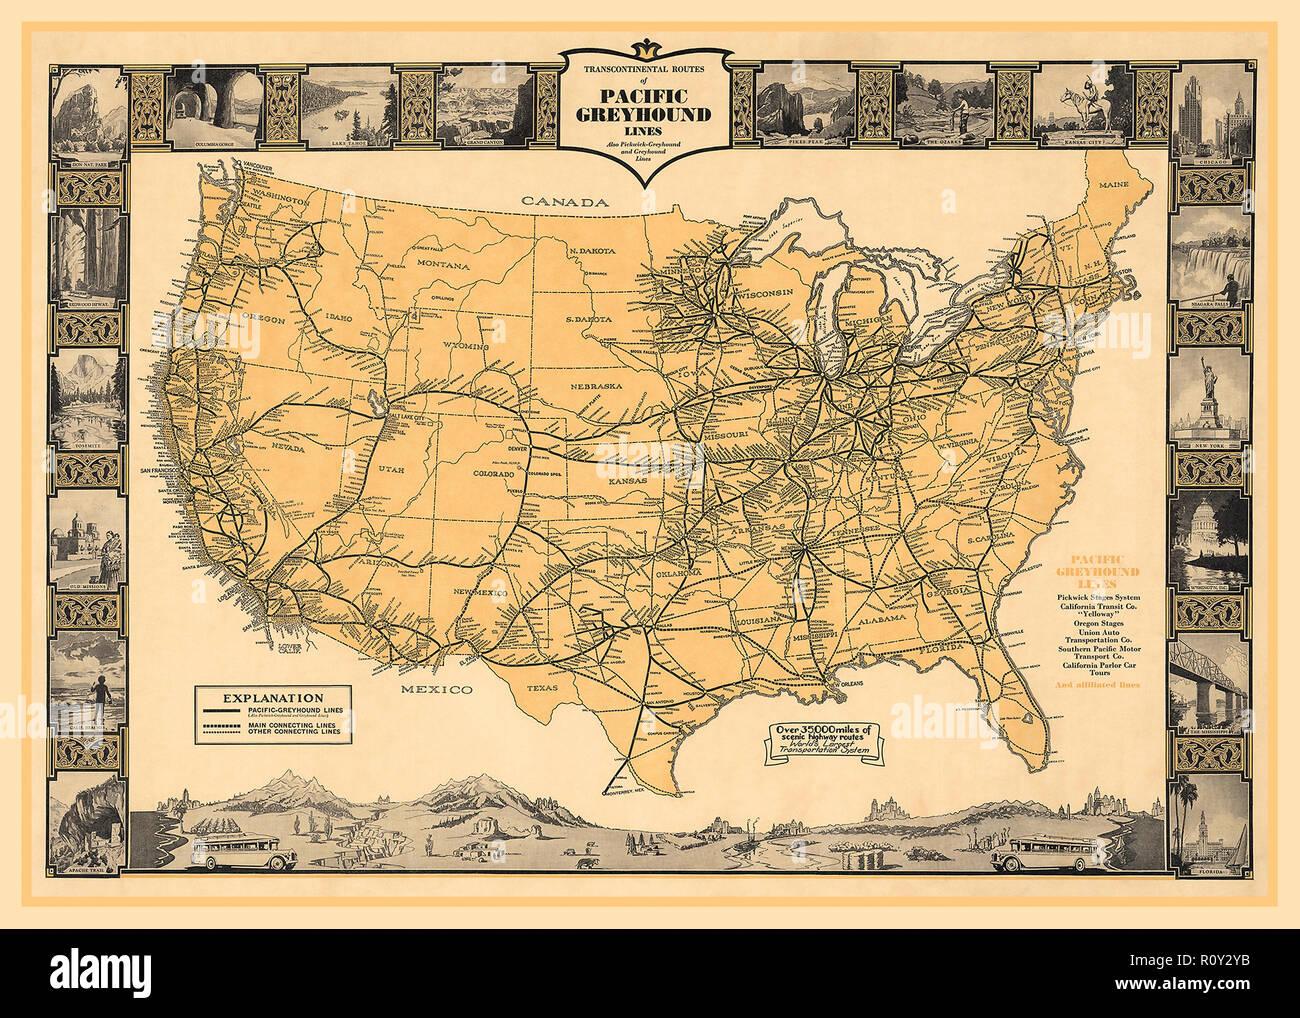 Vintage Usa Map Stockfotos & Vintage Usa Map Bilder - Alamy